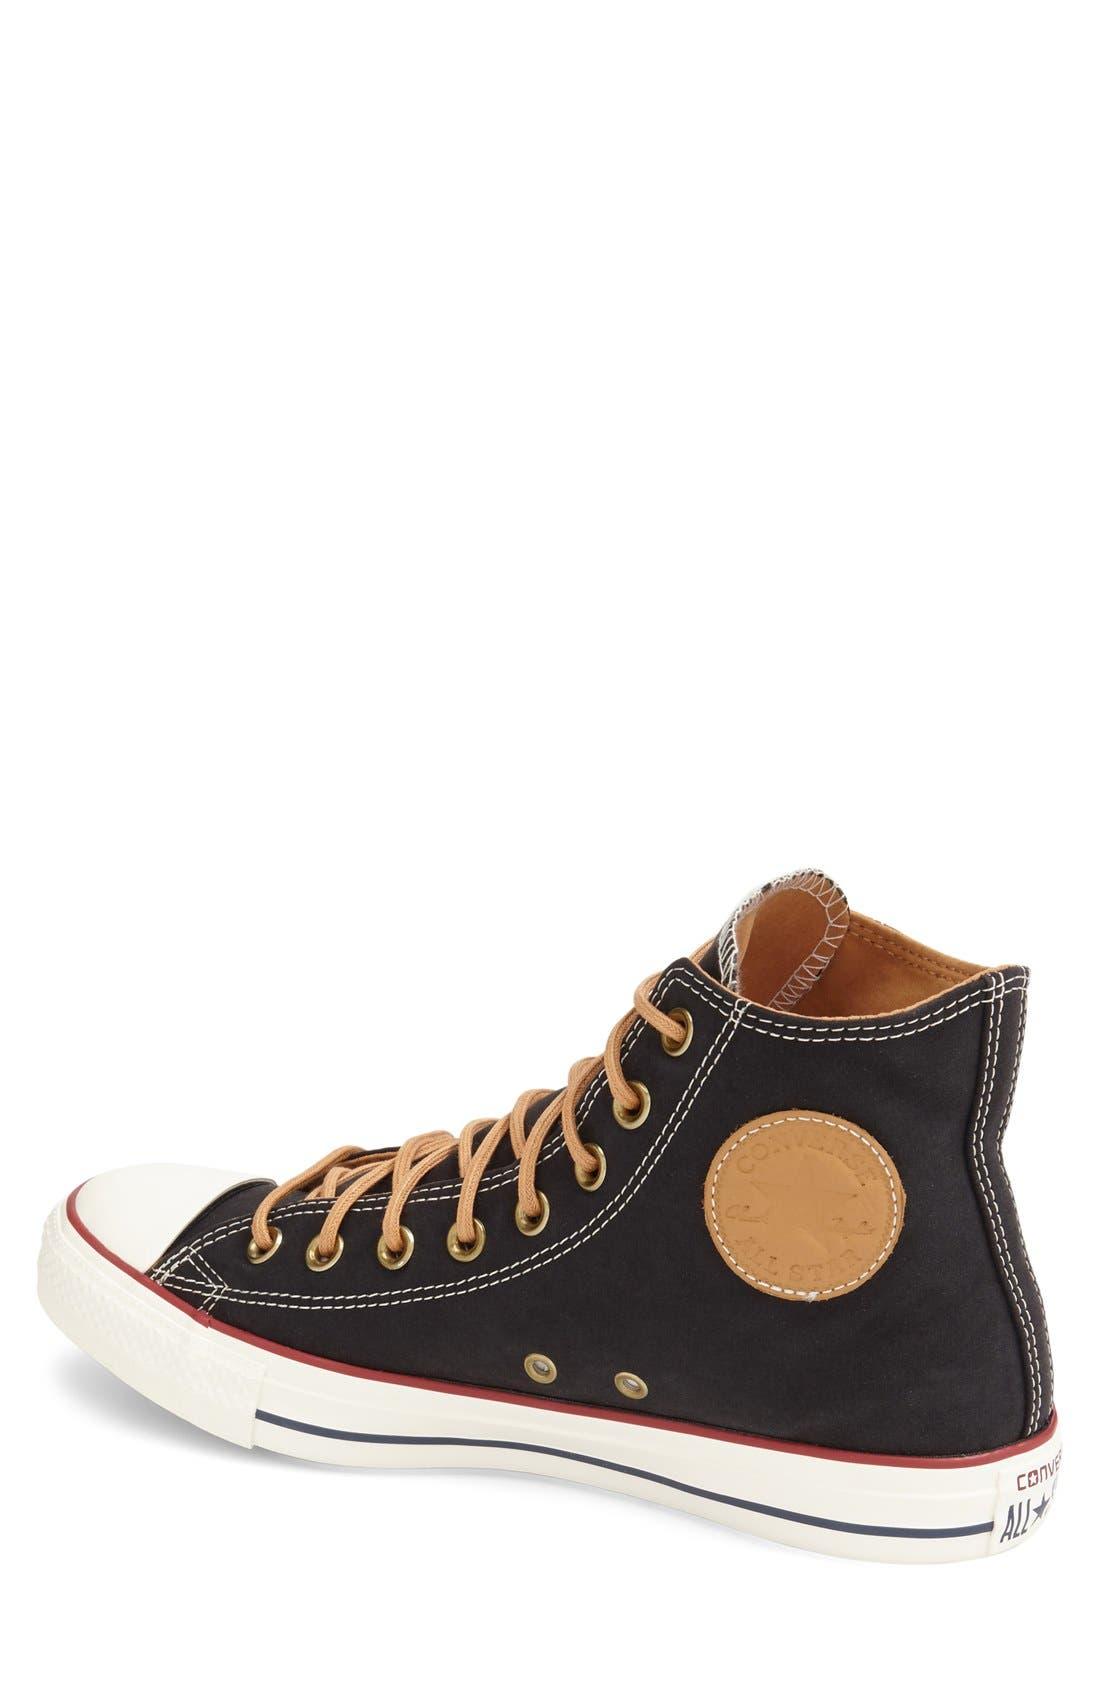 Alternate Image 2  - Converse Chuck Taylor® All Star® High-Top Sneaker (Men)